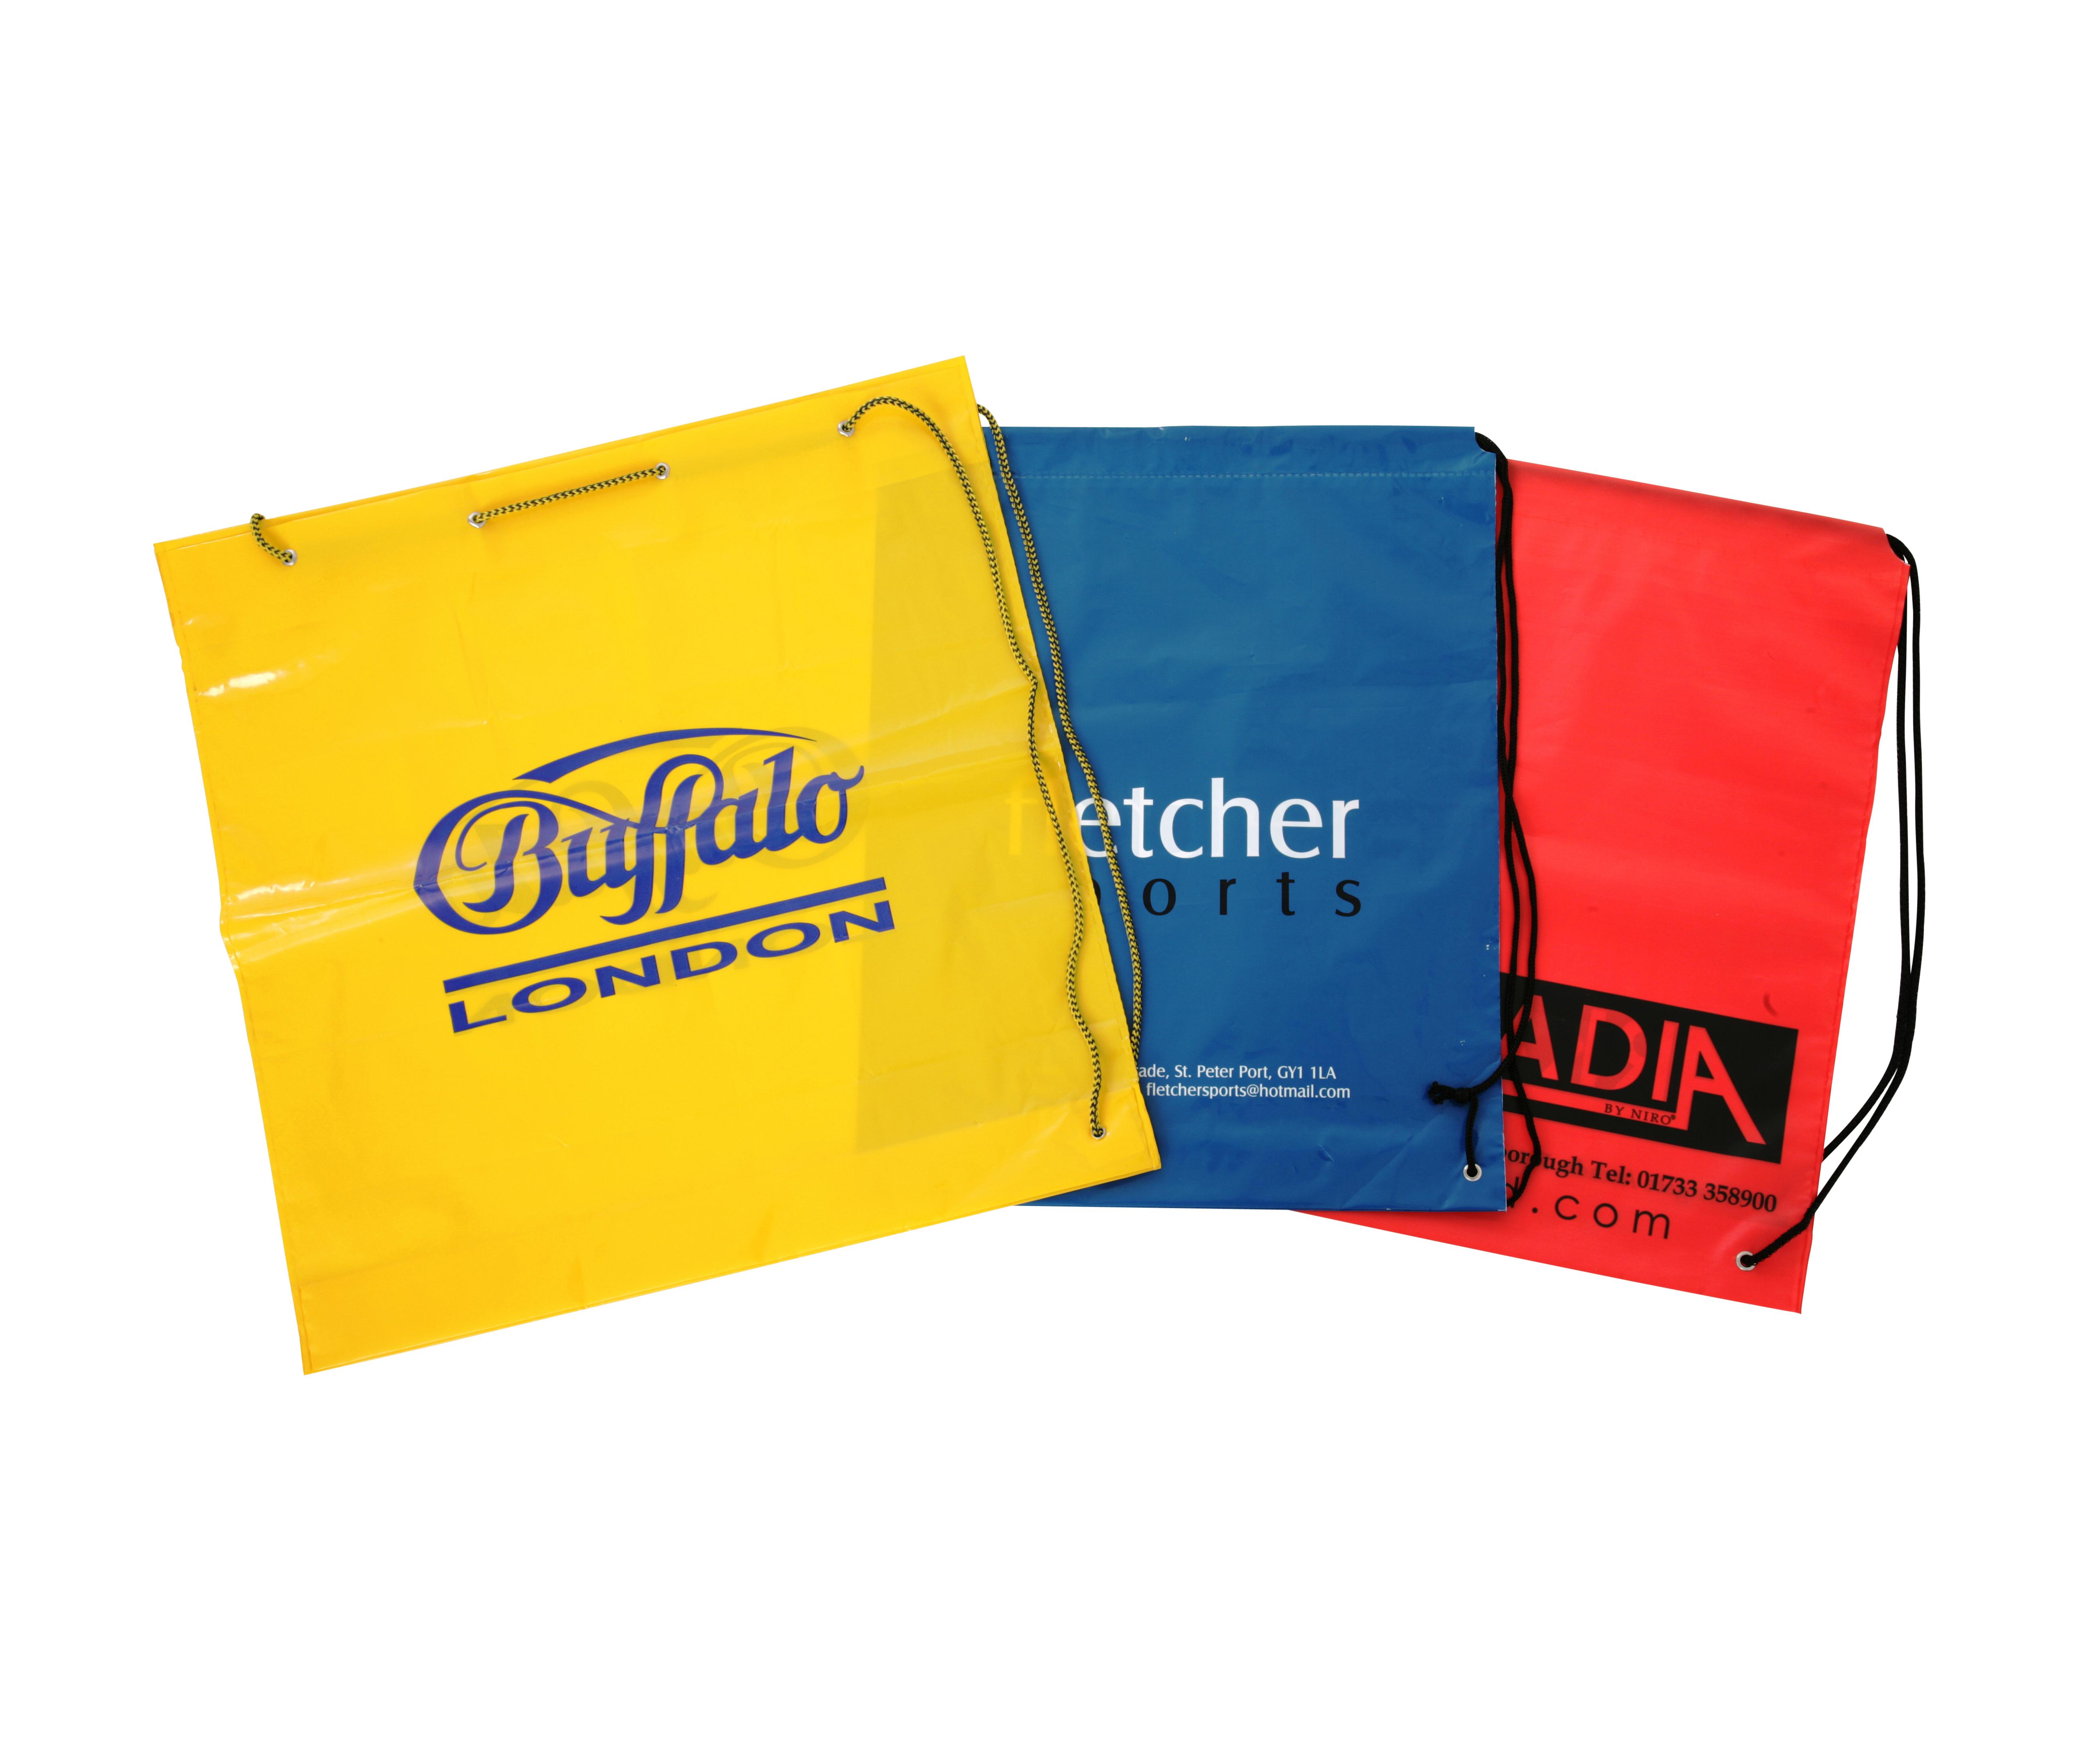 Three Premium Bespoke Duffle Bags